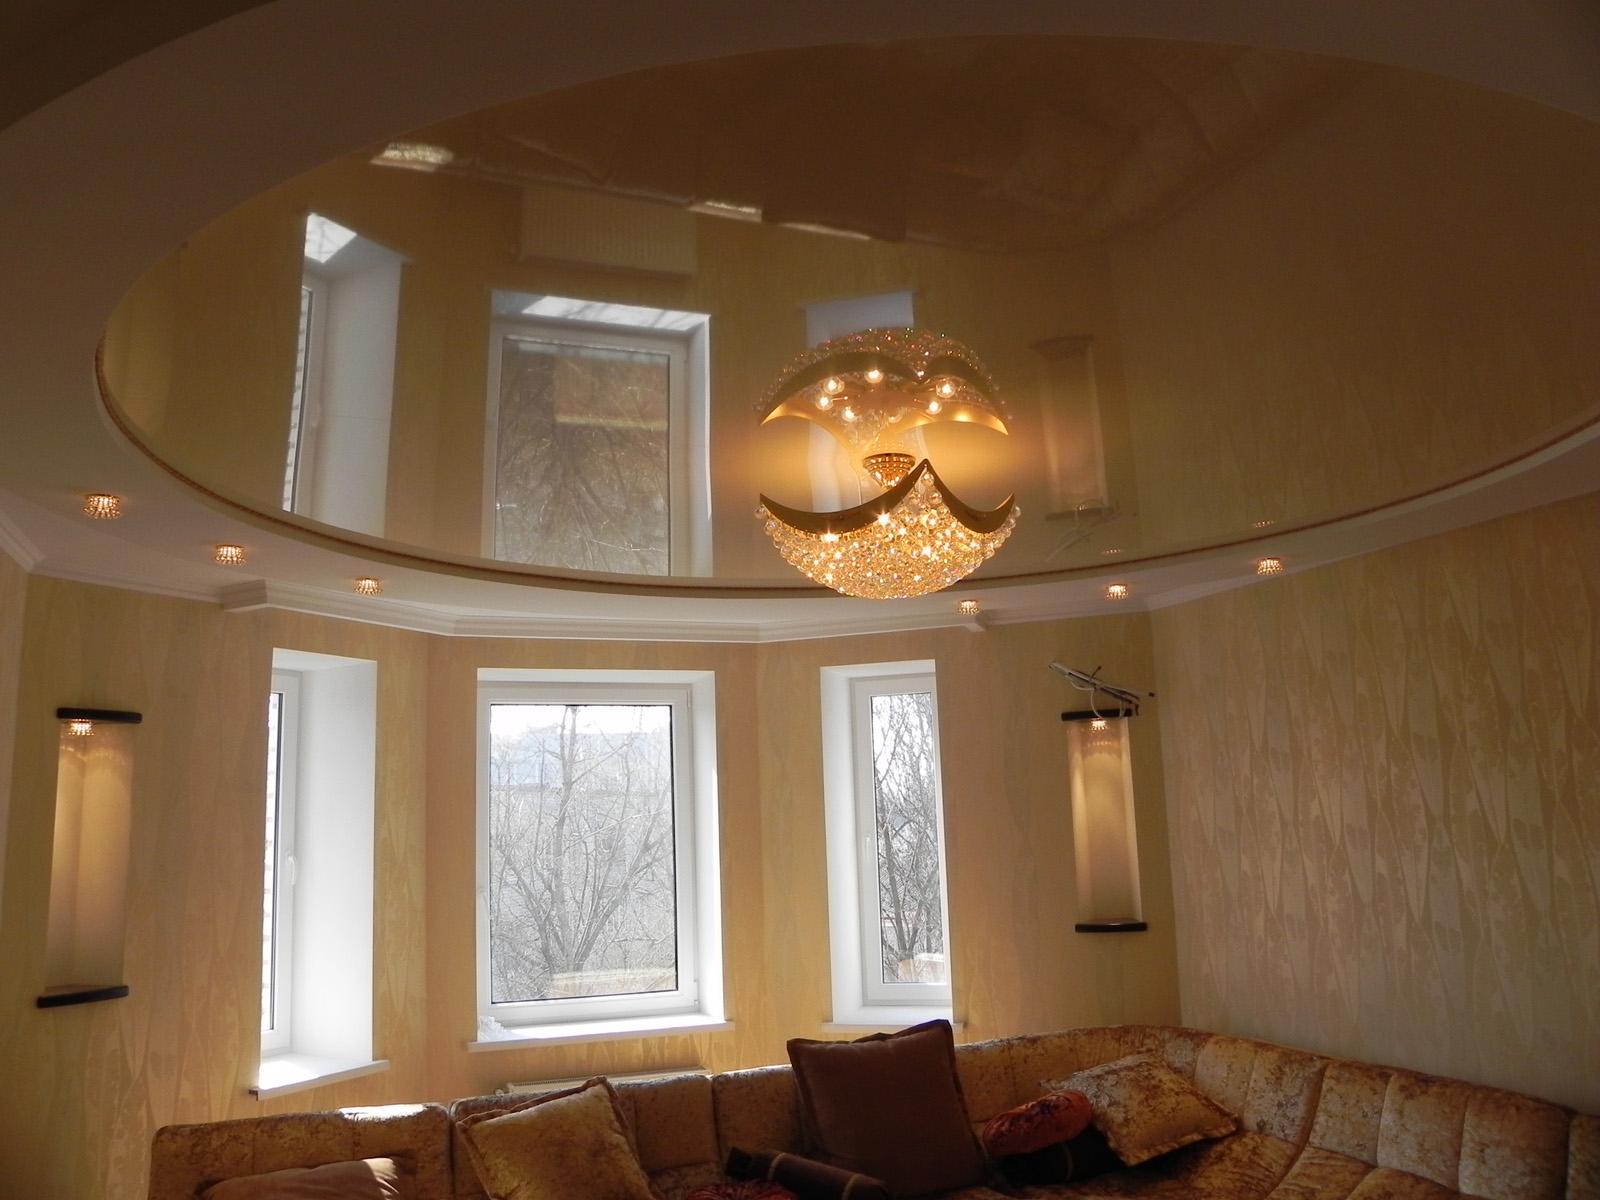 plafond salle de bain platre besancon service travaux orpea aurillac soci t afkje. Black Bedroom Furniture Sets. Home Design Ideas